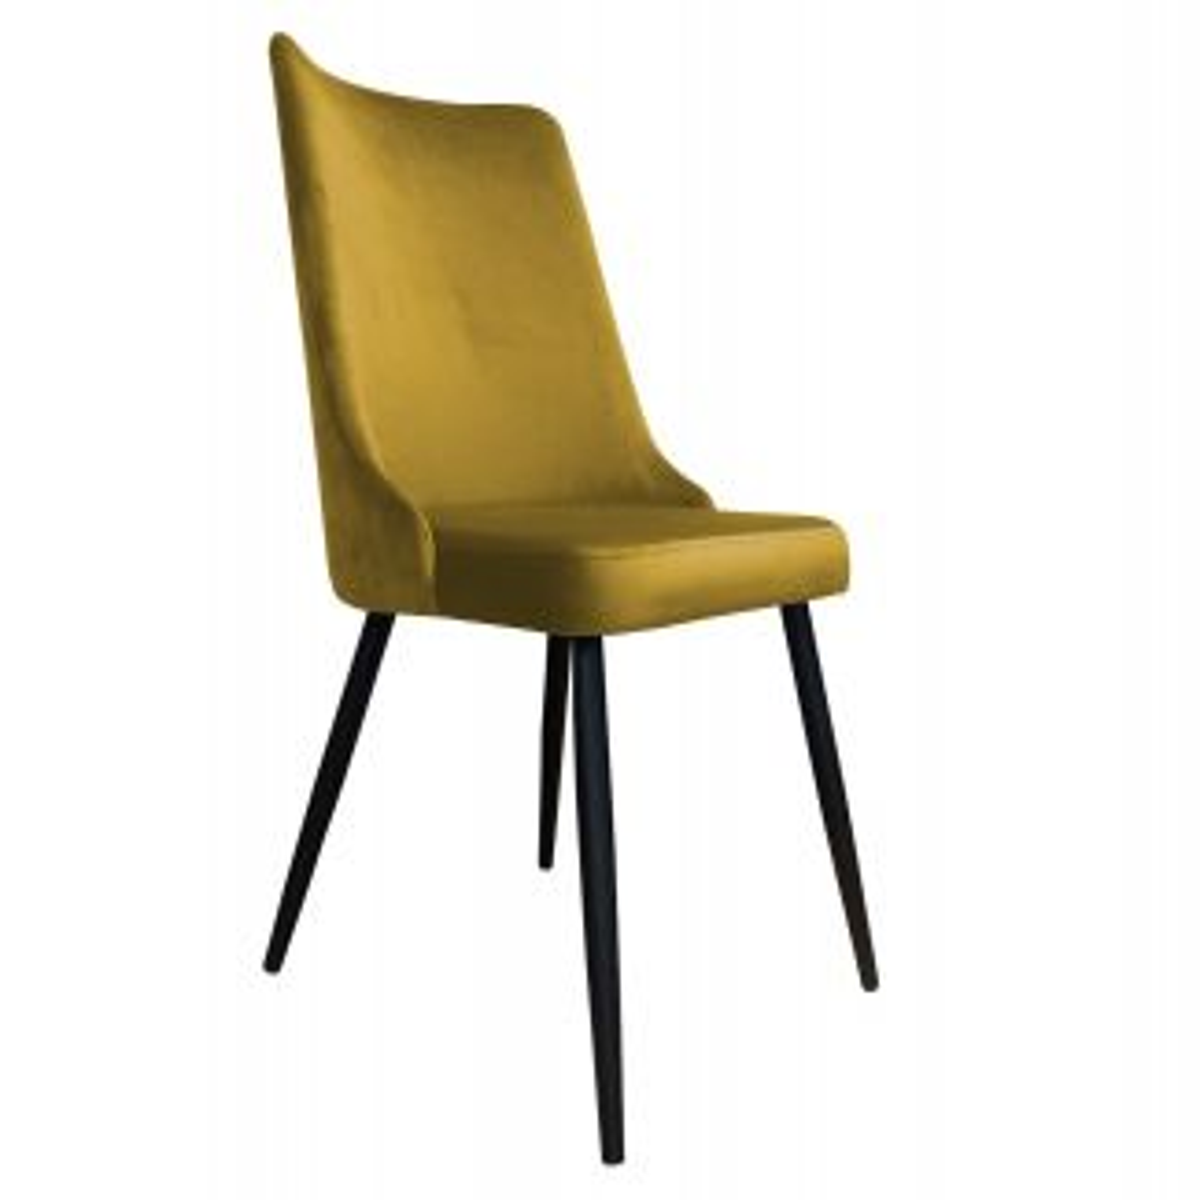 Krzesło CYPRIAN VELVET żółte